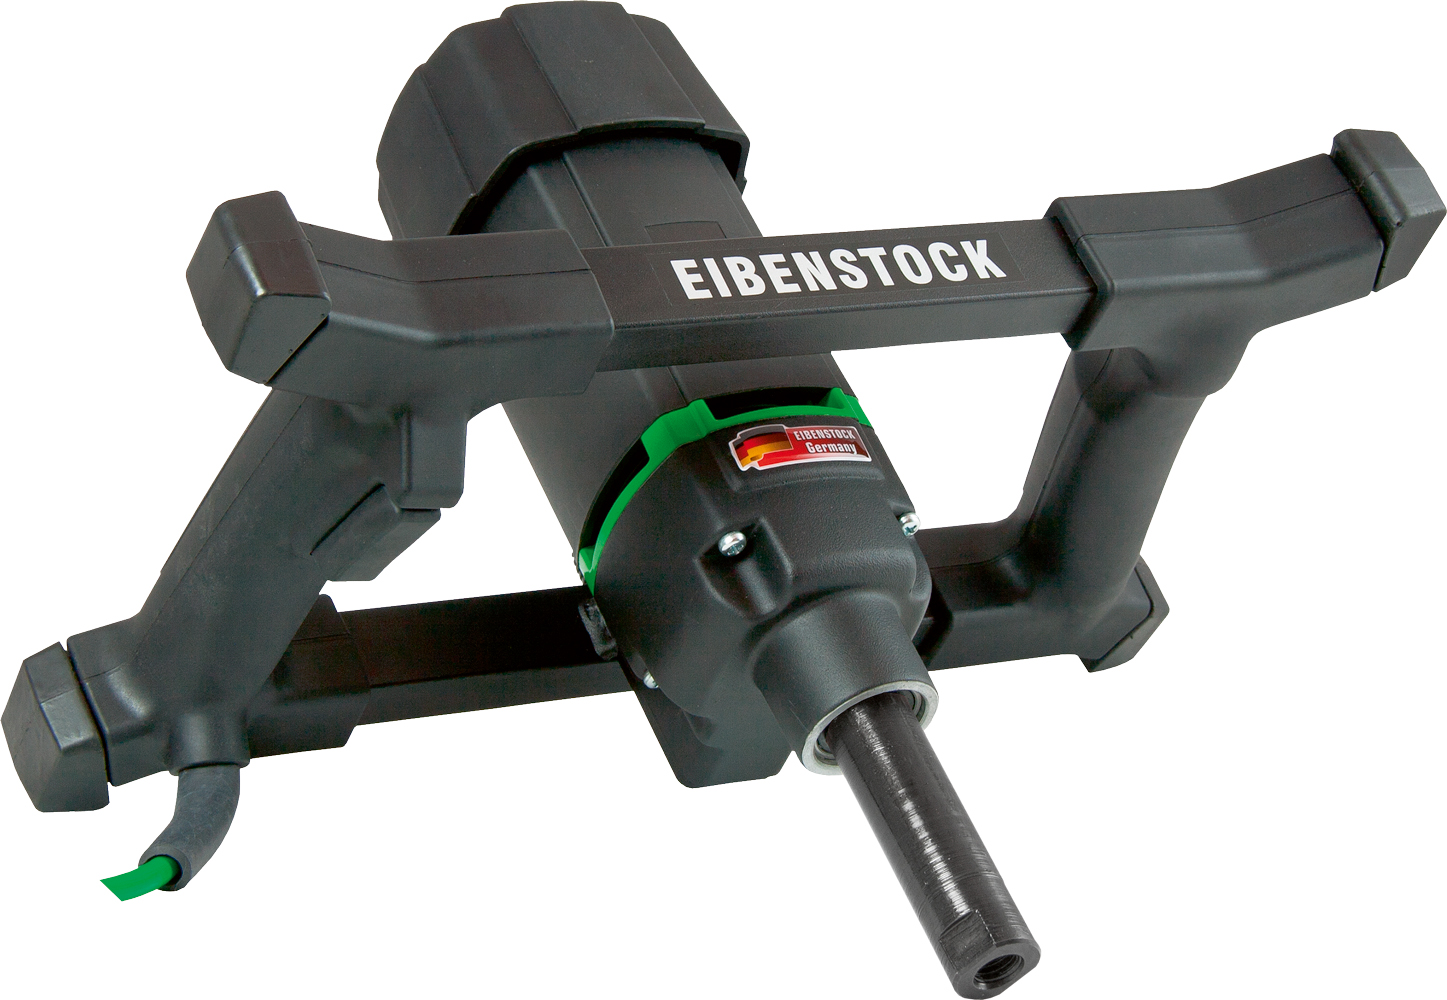 Eibenstock Handrührgerät EHR 18.1 Set